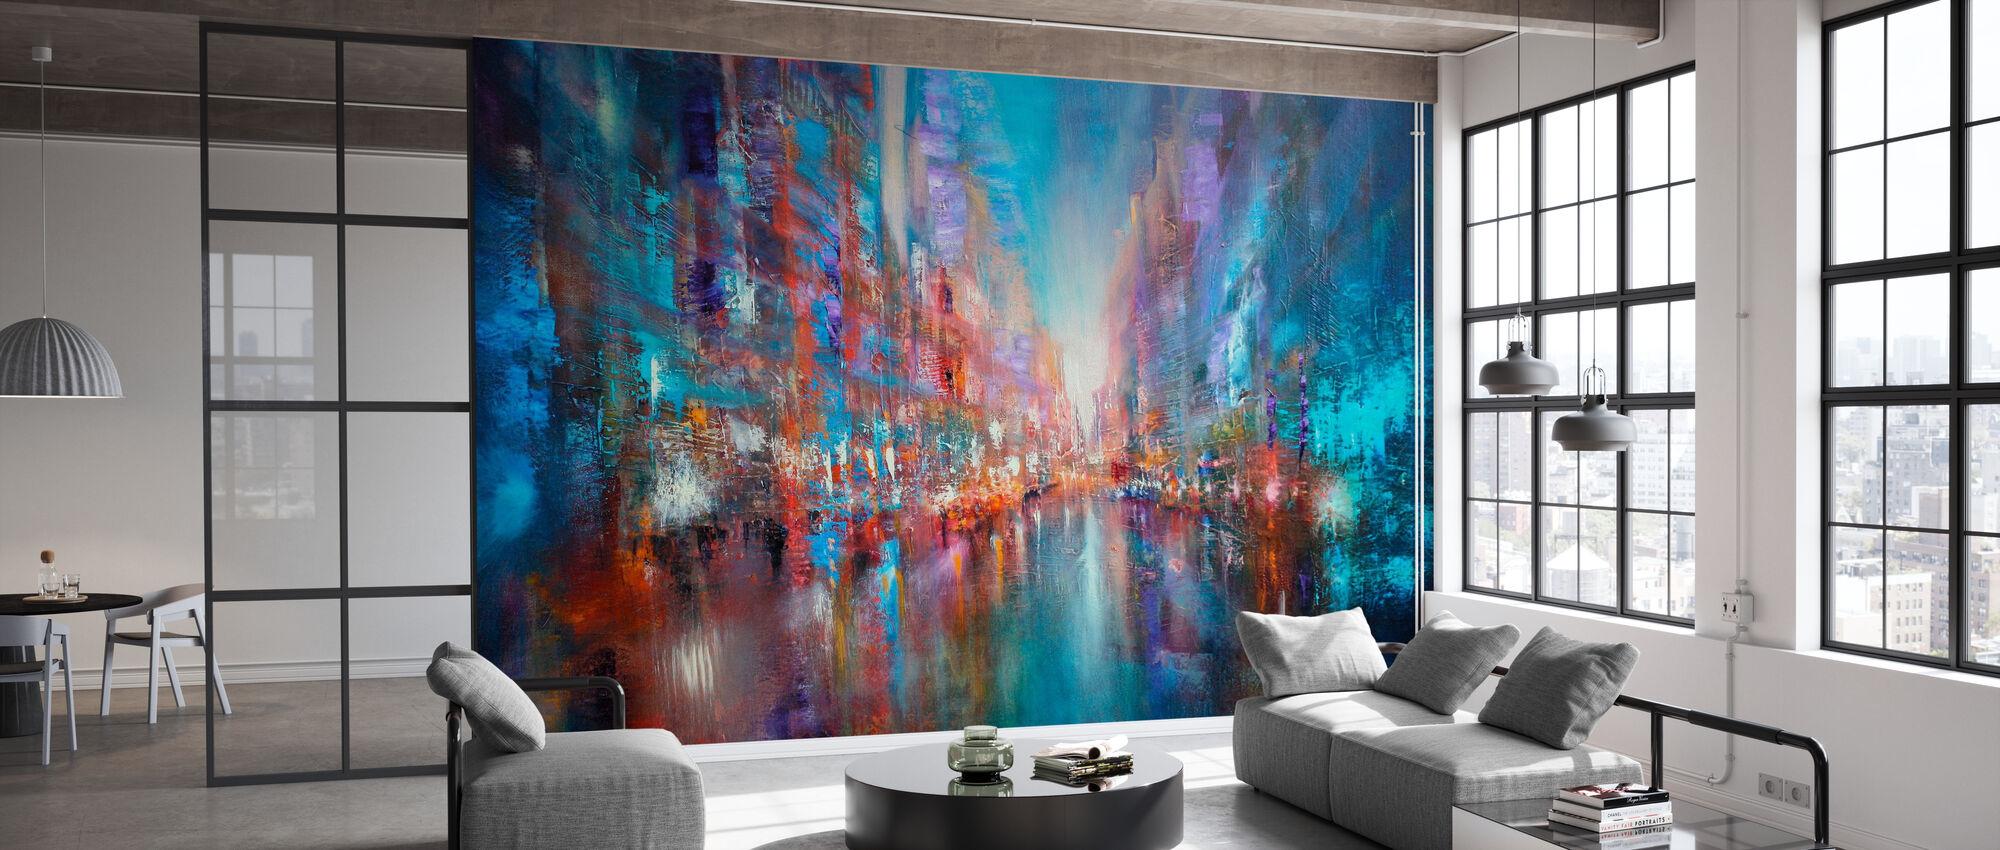 Blue City - Wallpaper - Office